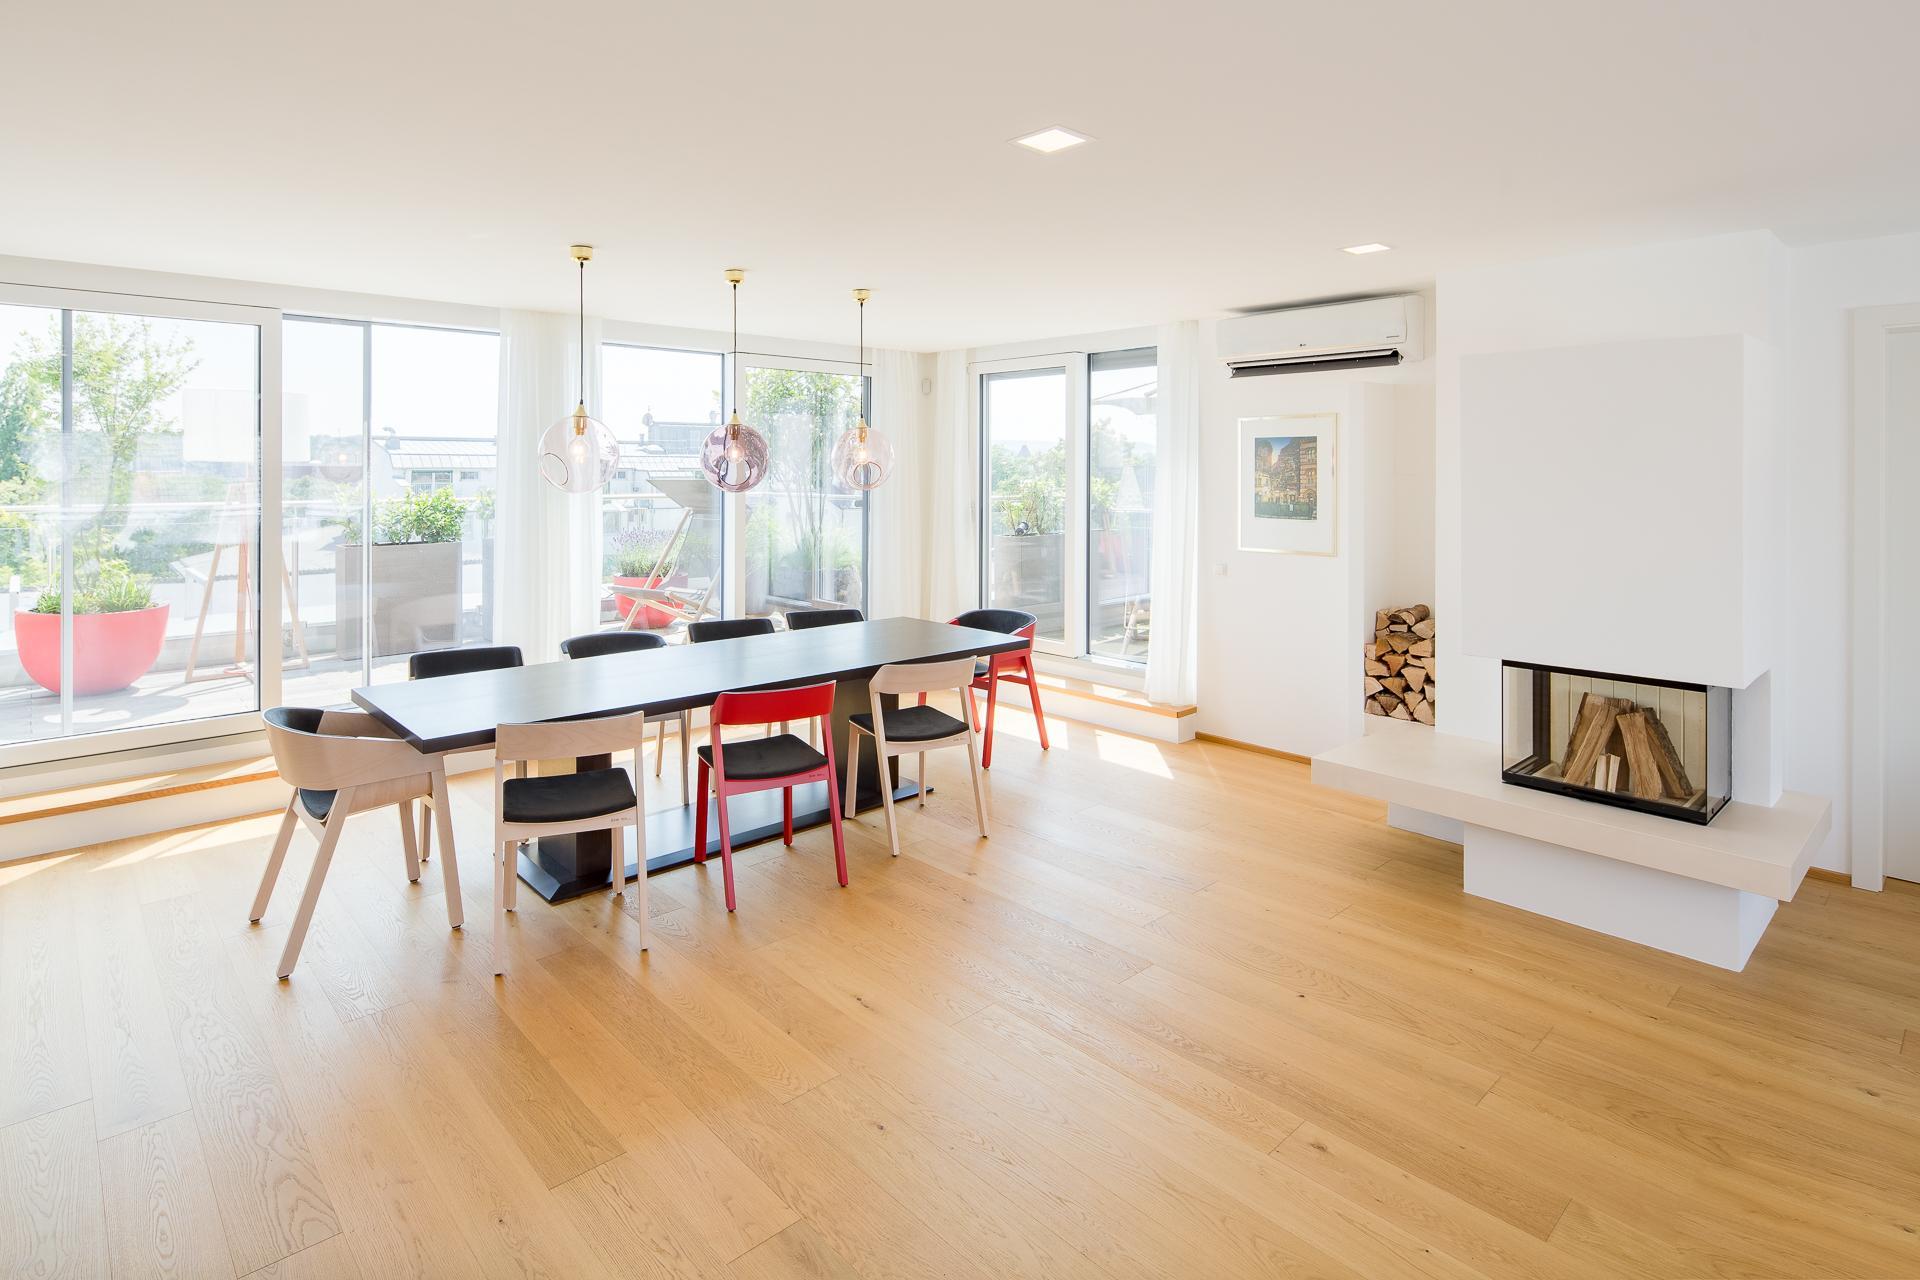 smeg k hlschrank bilder ideen couchstyle. Black Bedroom Furniture Sets. Home Design Ideas